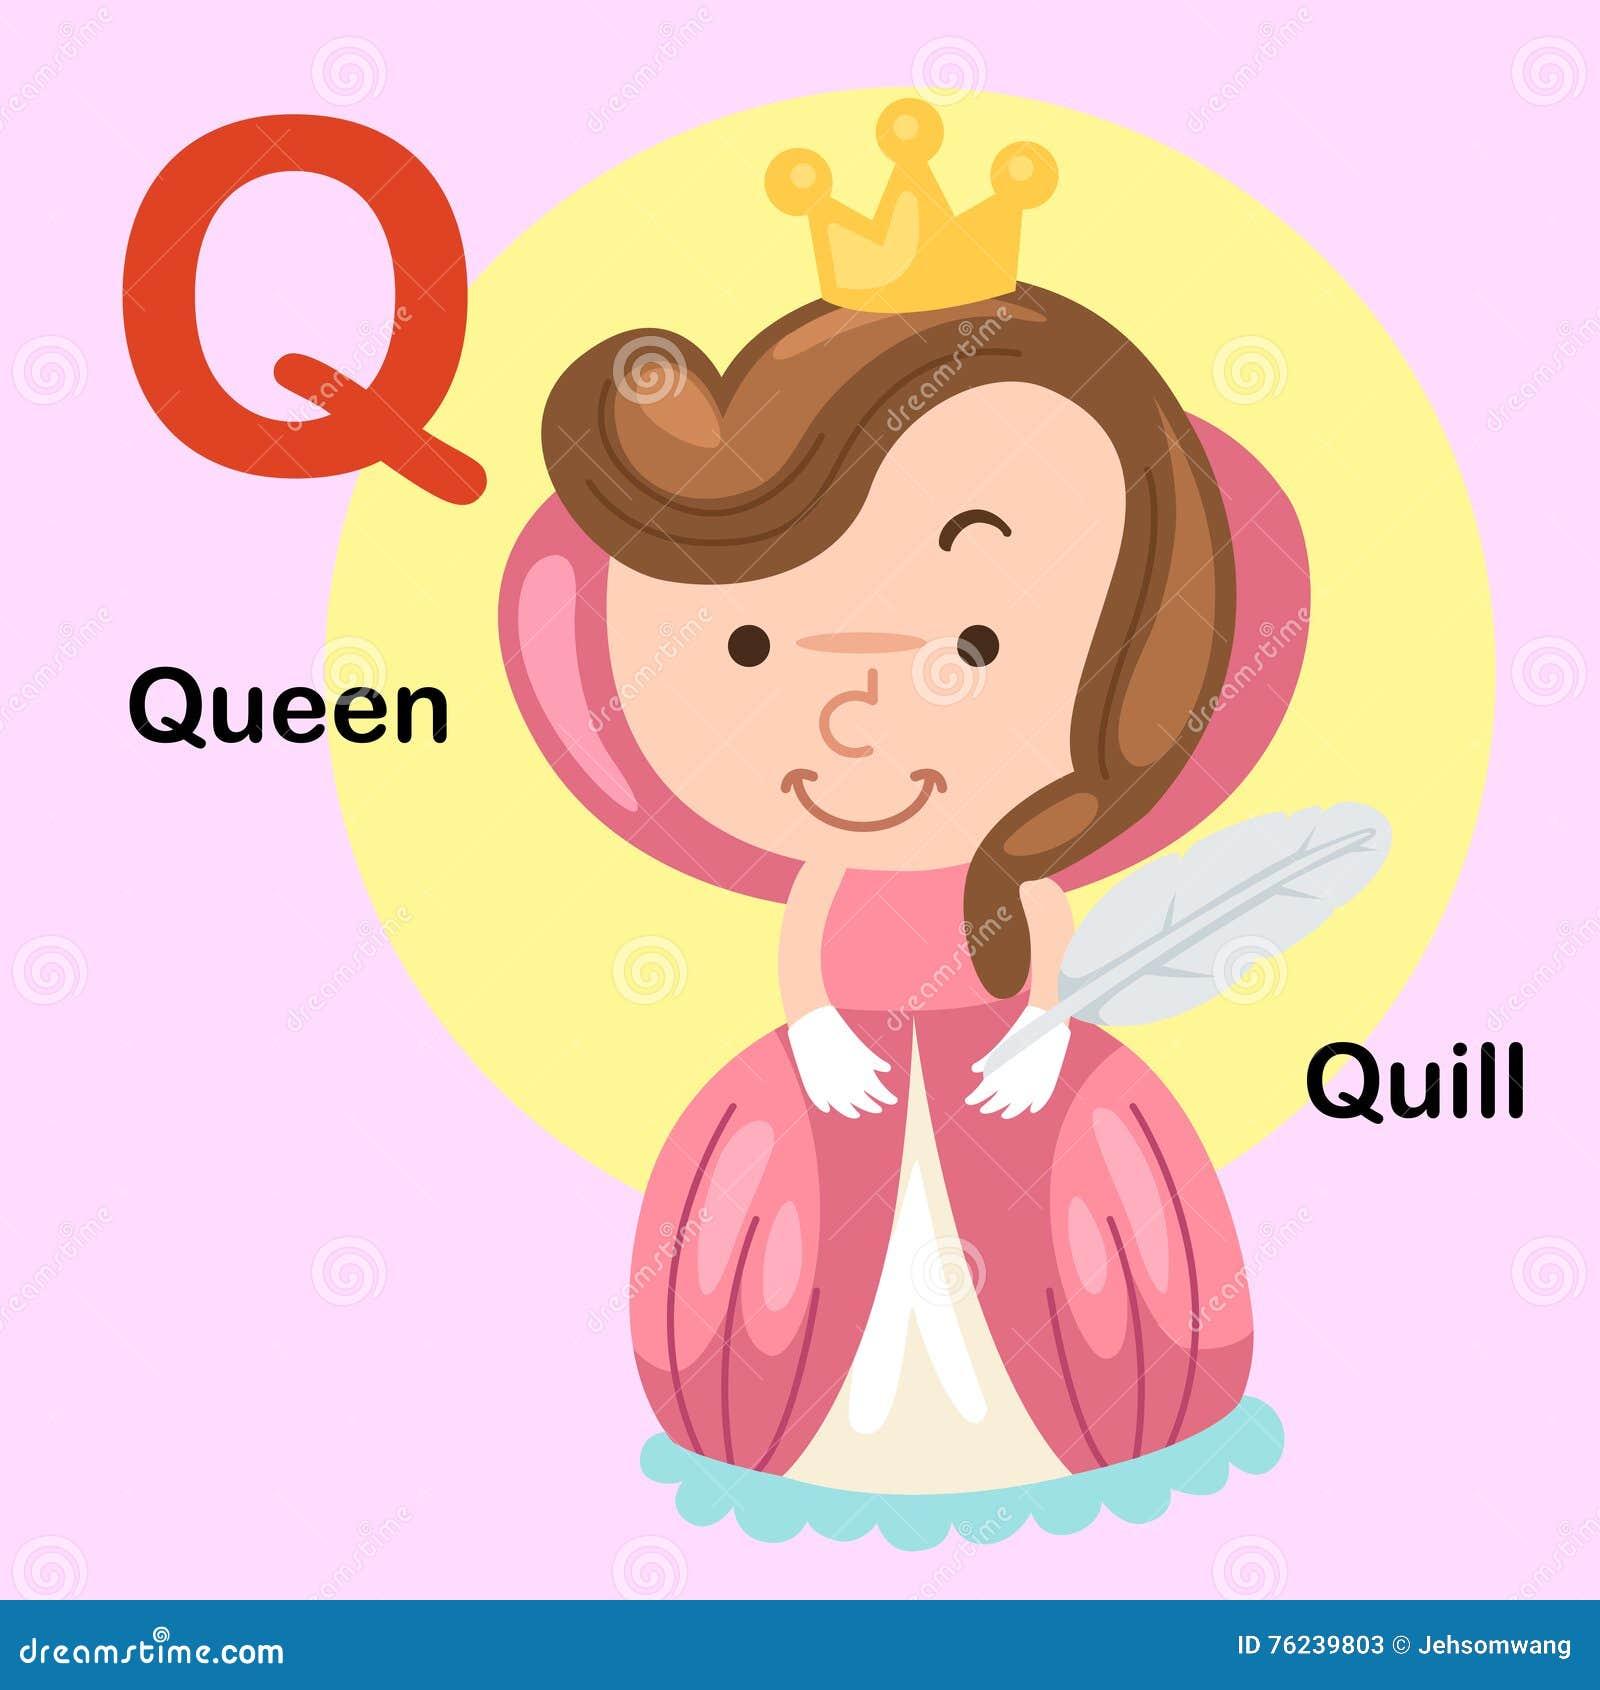 Illustration Alphabet Letter Q-Queen,Quill Stock Vector ...